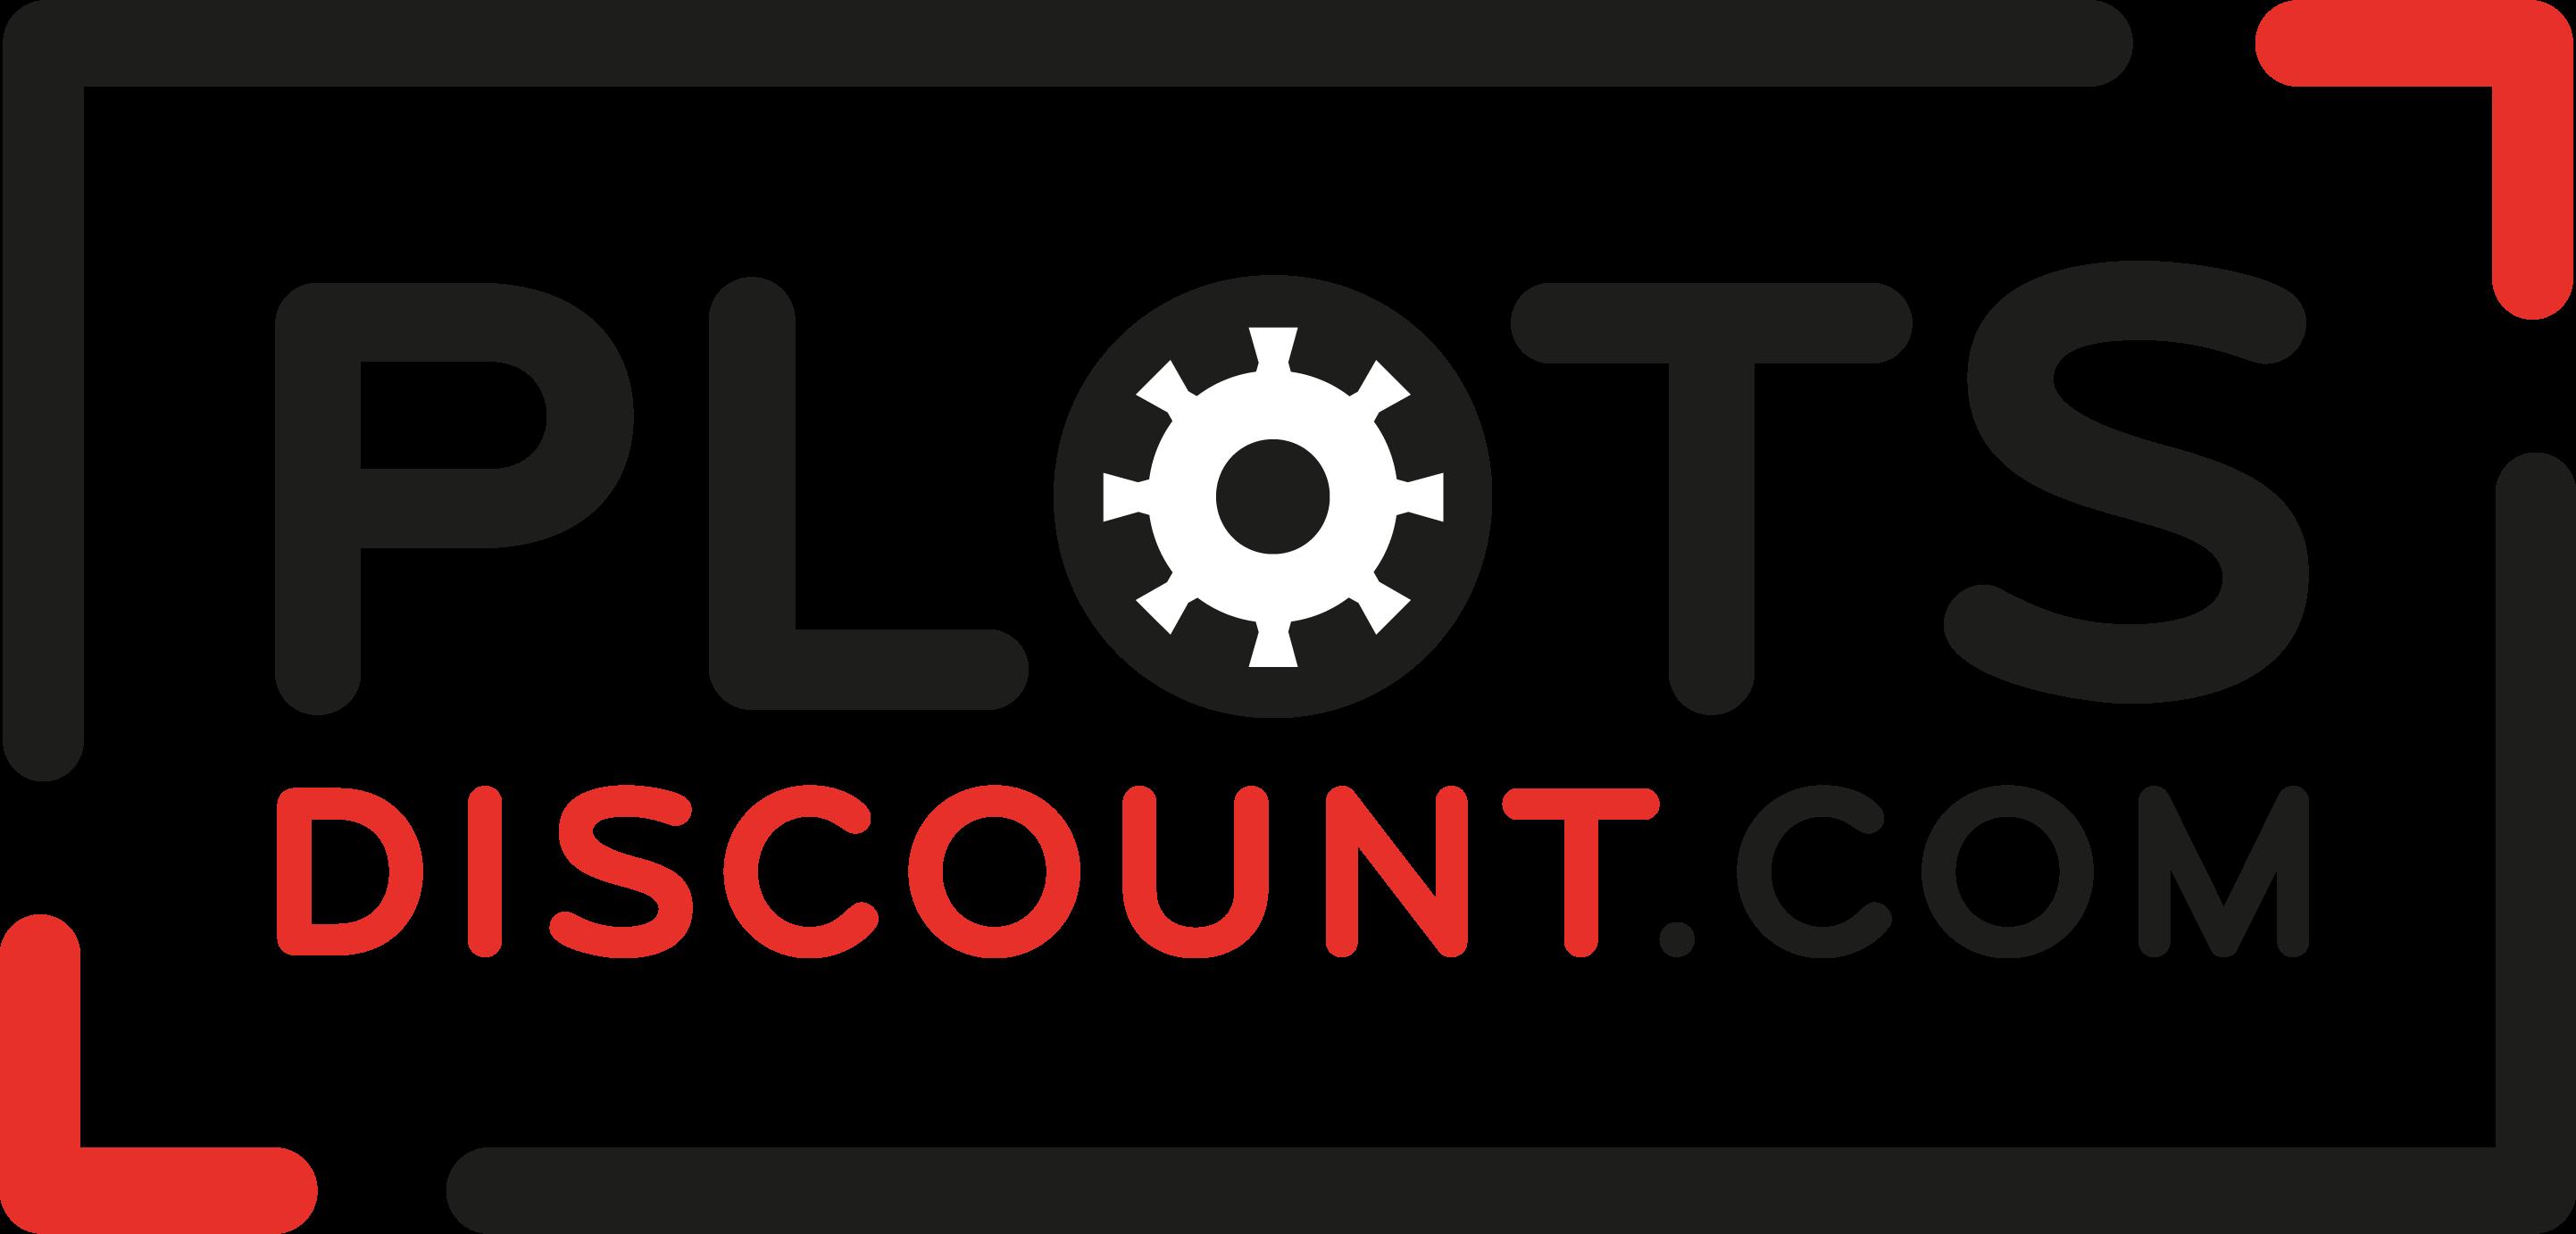 Plots-discount